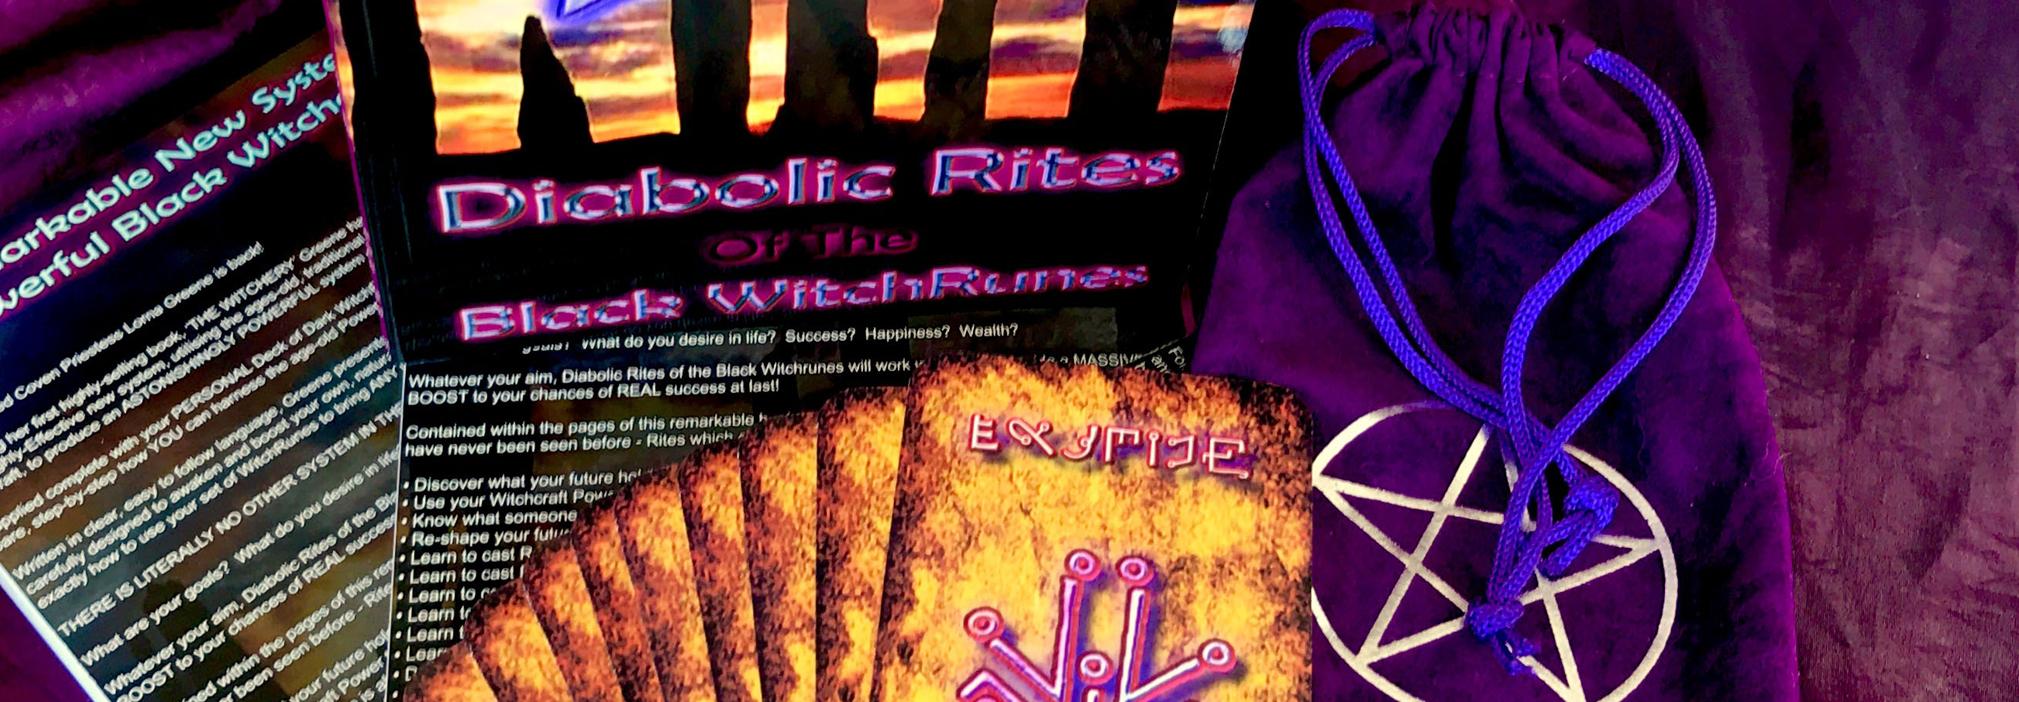 Dæmonic Dreams - Dæmonic Dreams Occult Books and Tools